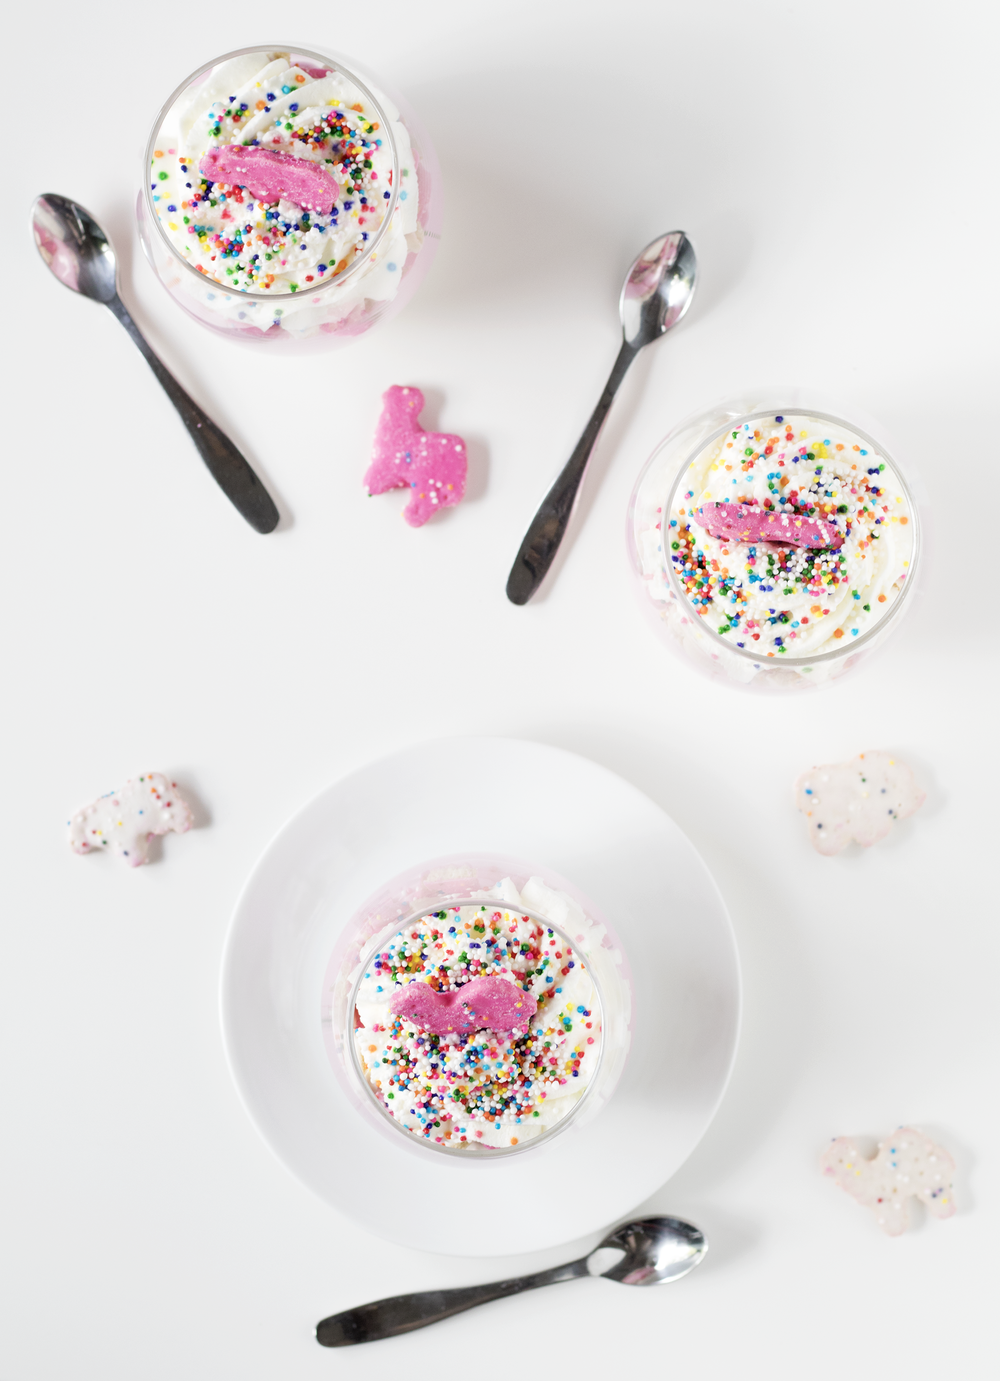 Circus Animal Cookie No-Bake Cheesecake Parfaits | Sarah Makes Stuff